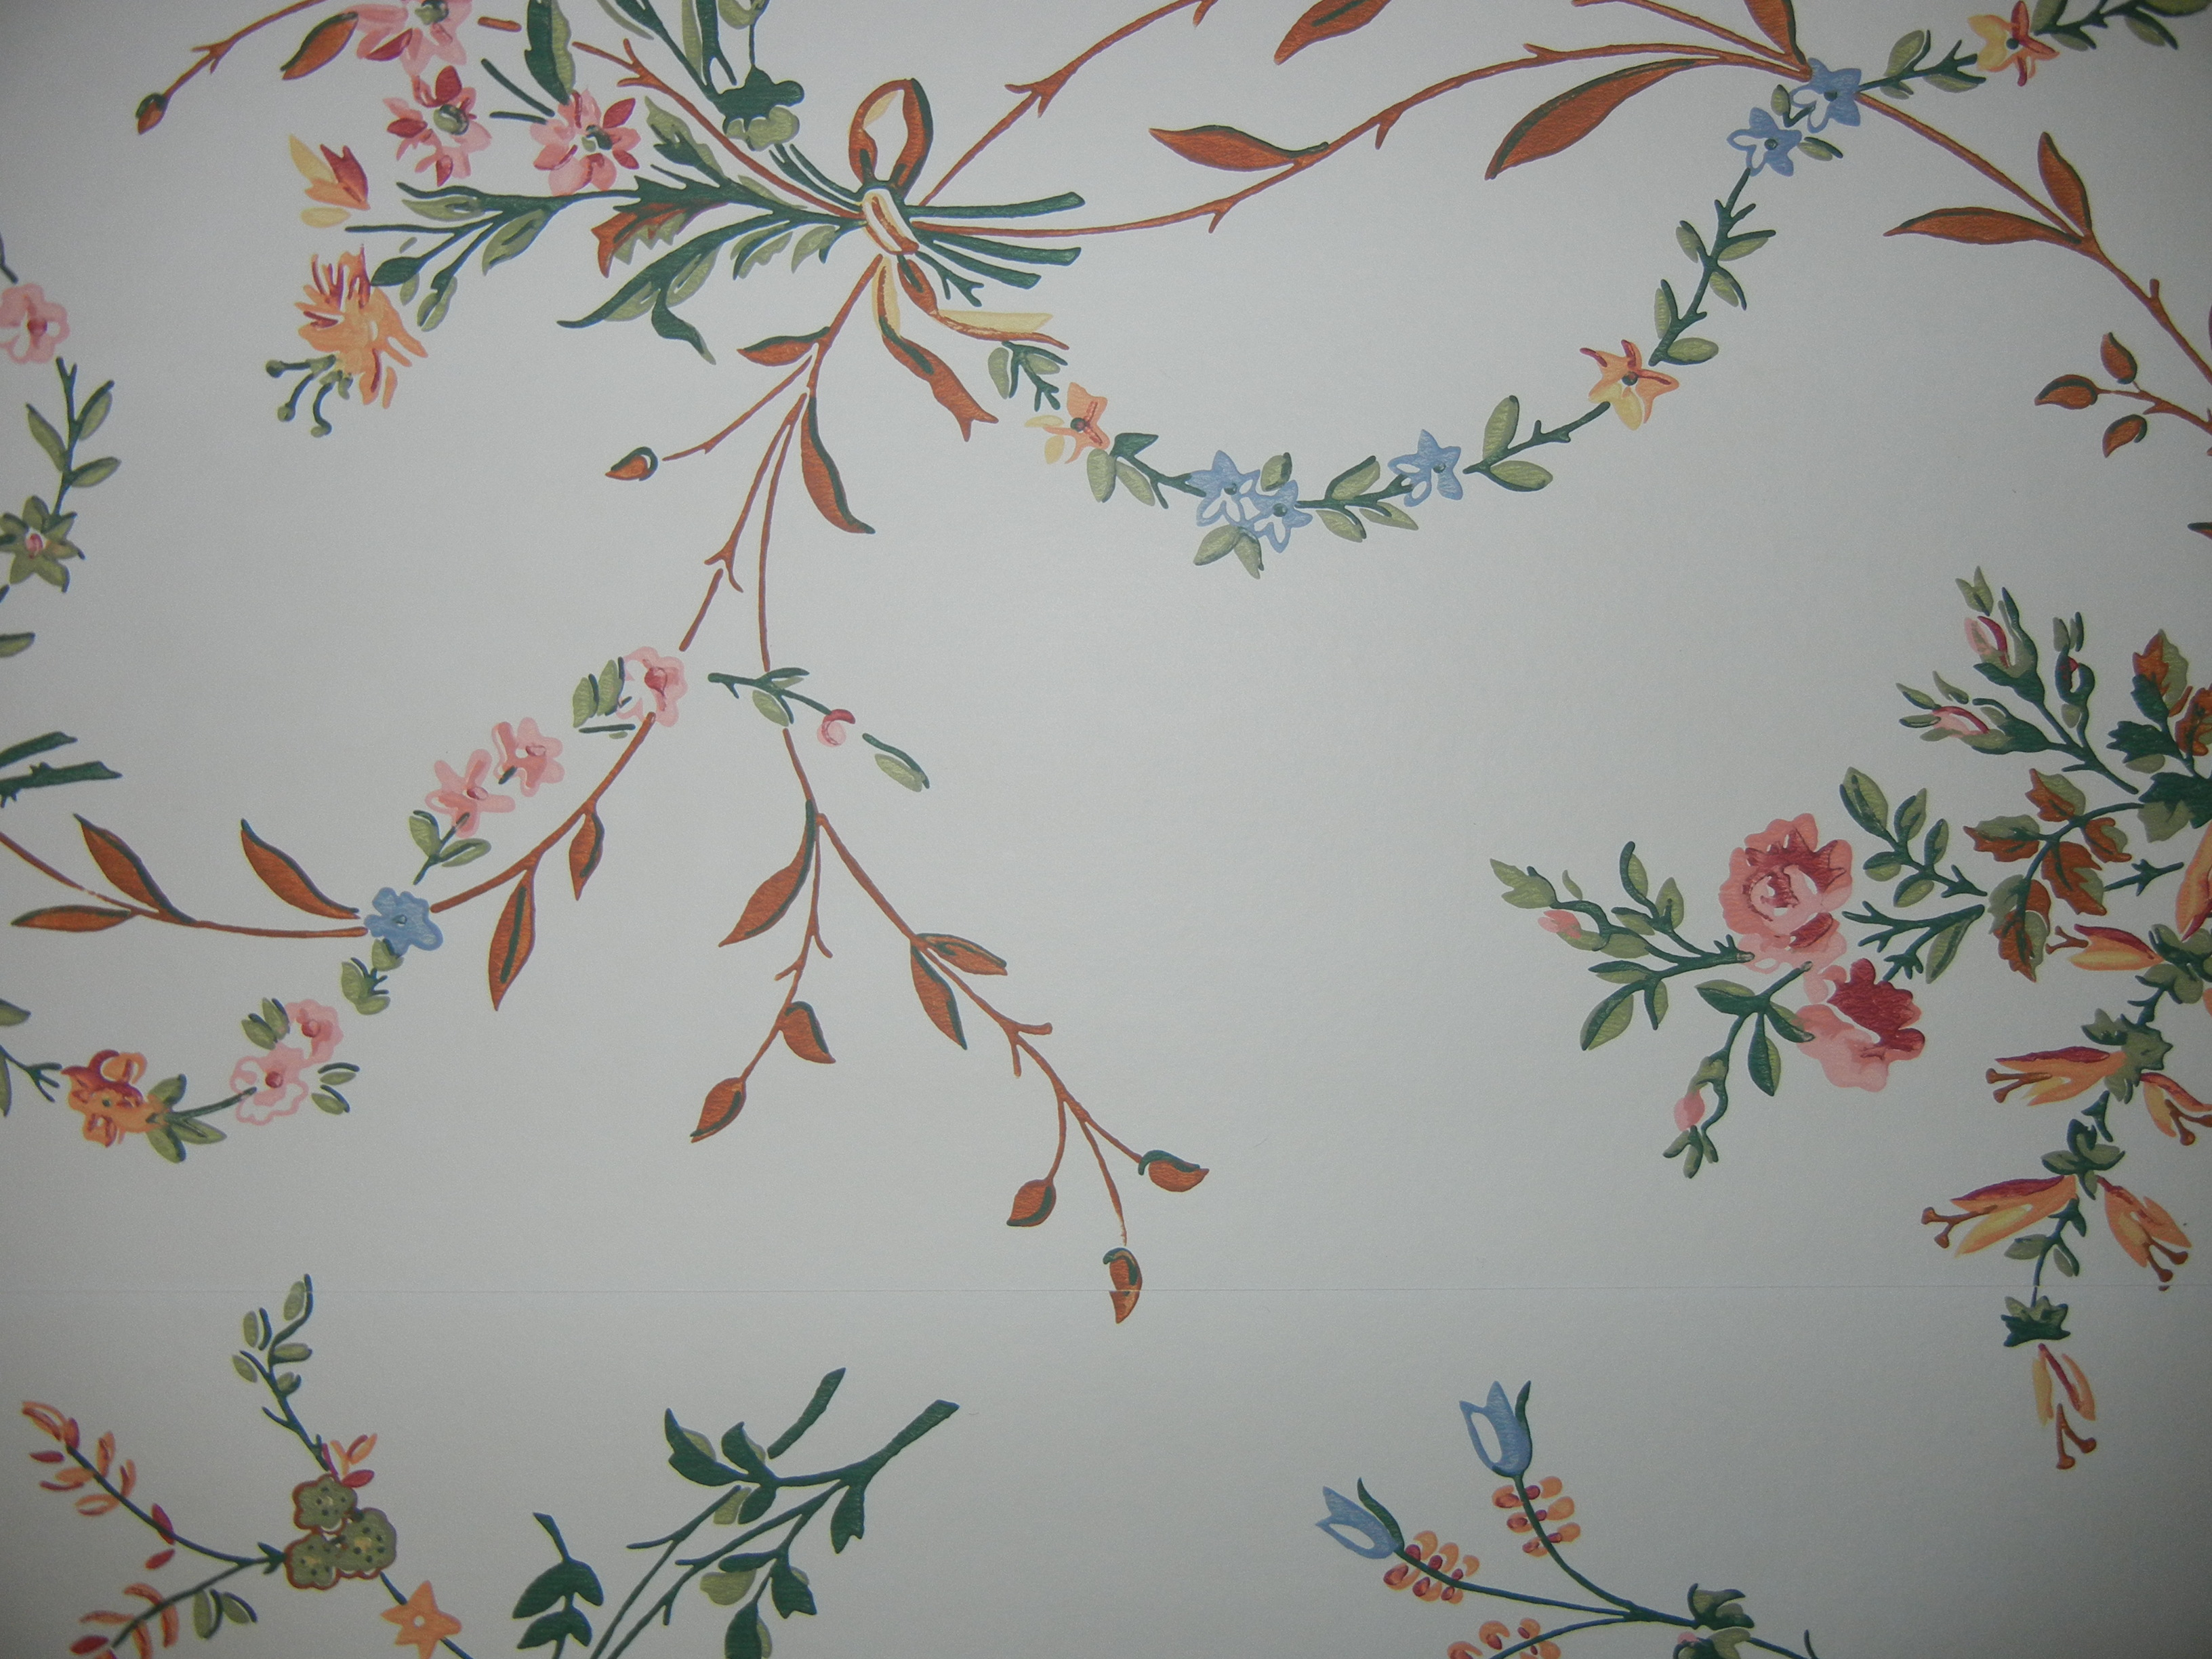 Historic Thomas Strahan Reproduction Wallpaper Quaint Victorian CALICO Floral